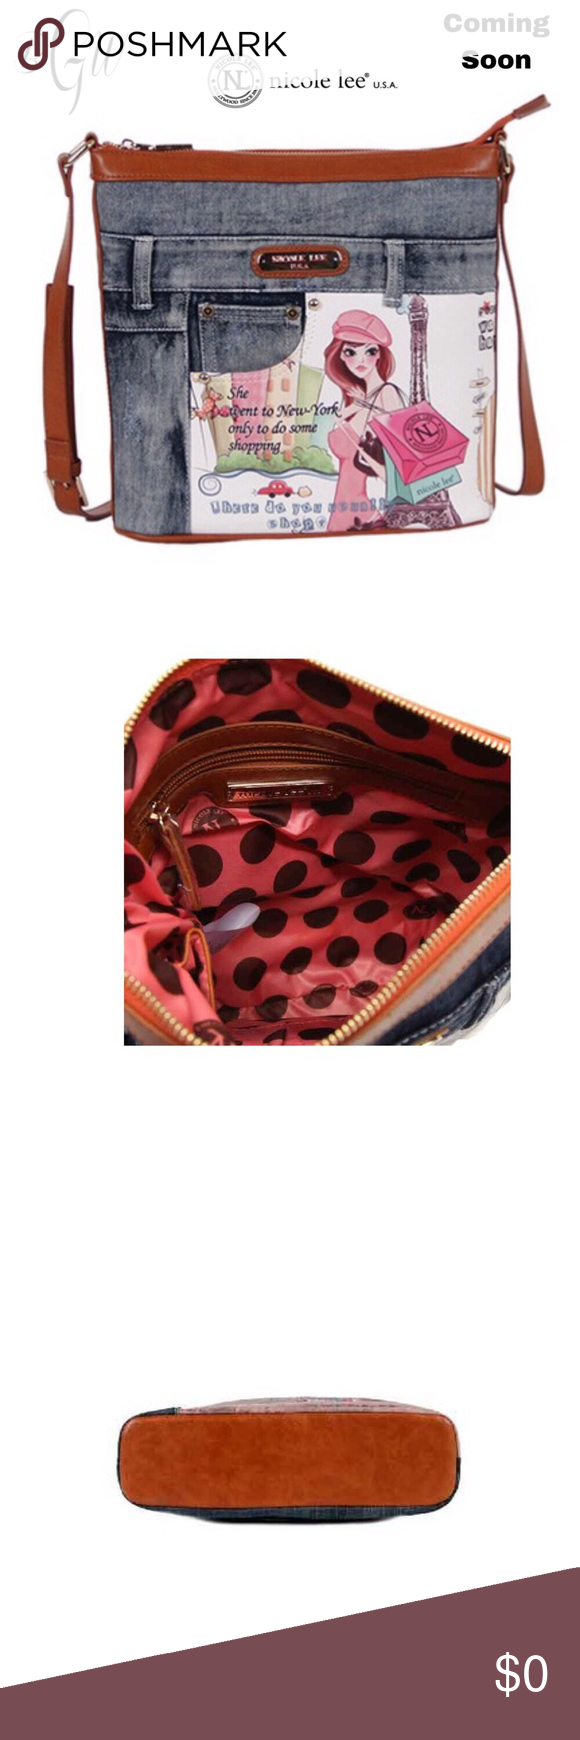 57225bd4aaa7 🎃FINAL SALE Nicole Lee Denim Buckle Crossbody Boutique | My Posh ...